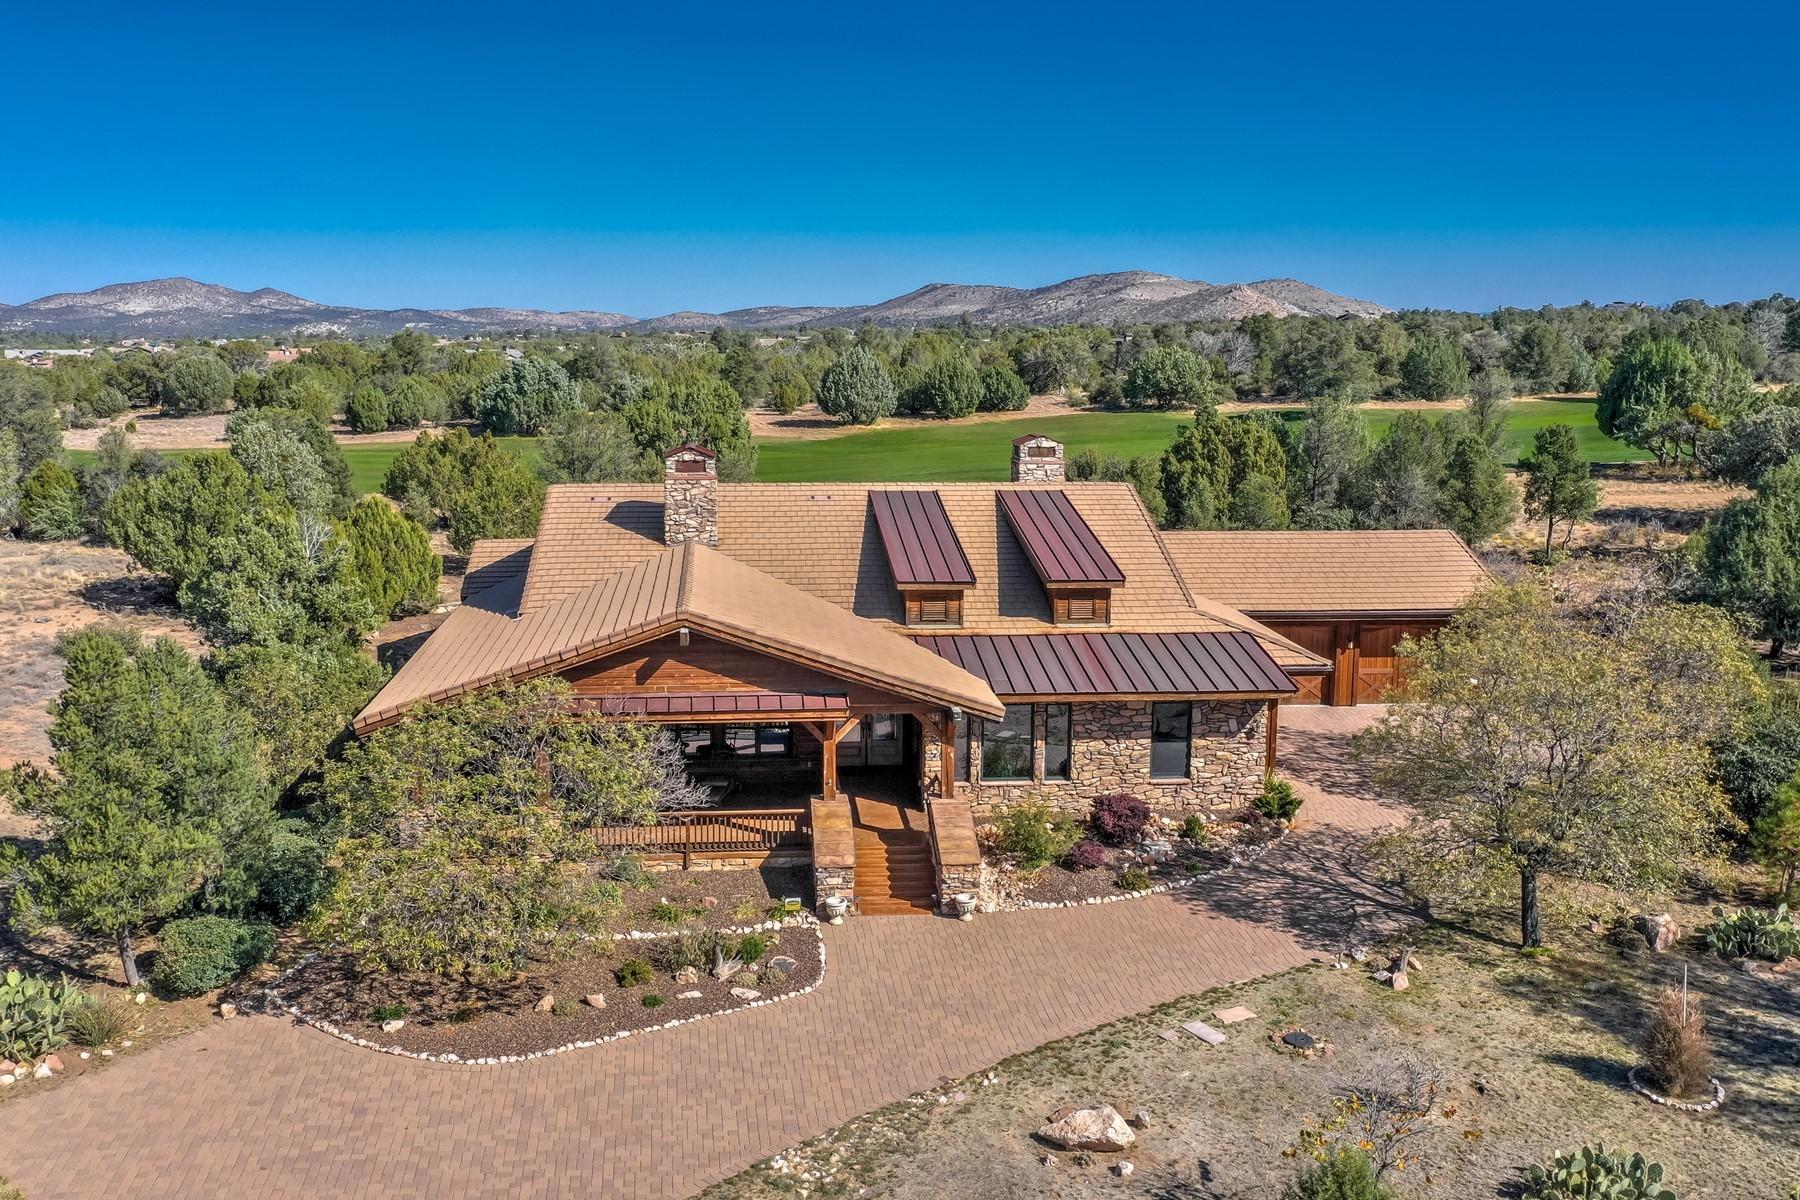 Single Family Homes for Active at Luxury Prescott Living 14580 N Pauls Spur Drive Prescott, Arizona 86305 United States